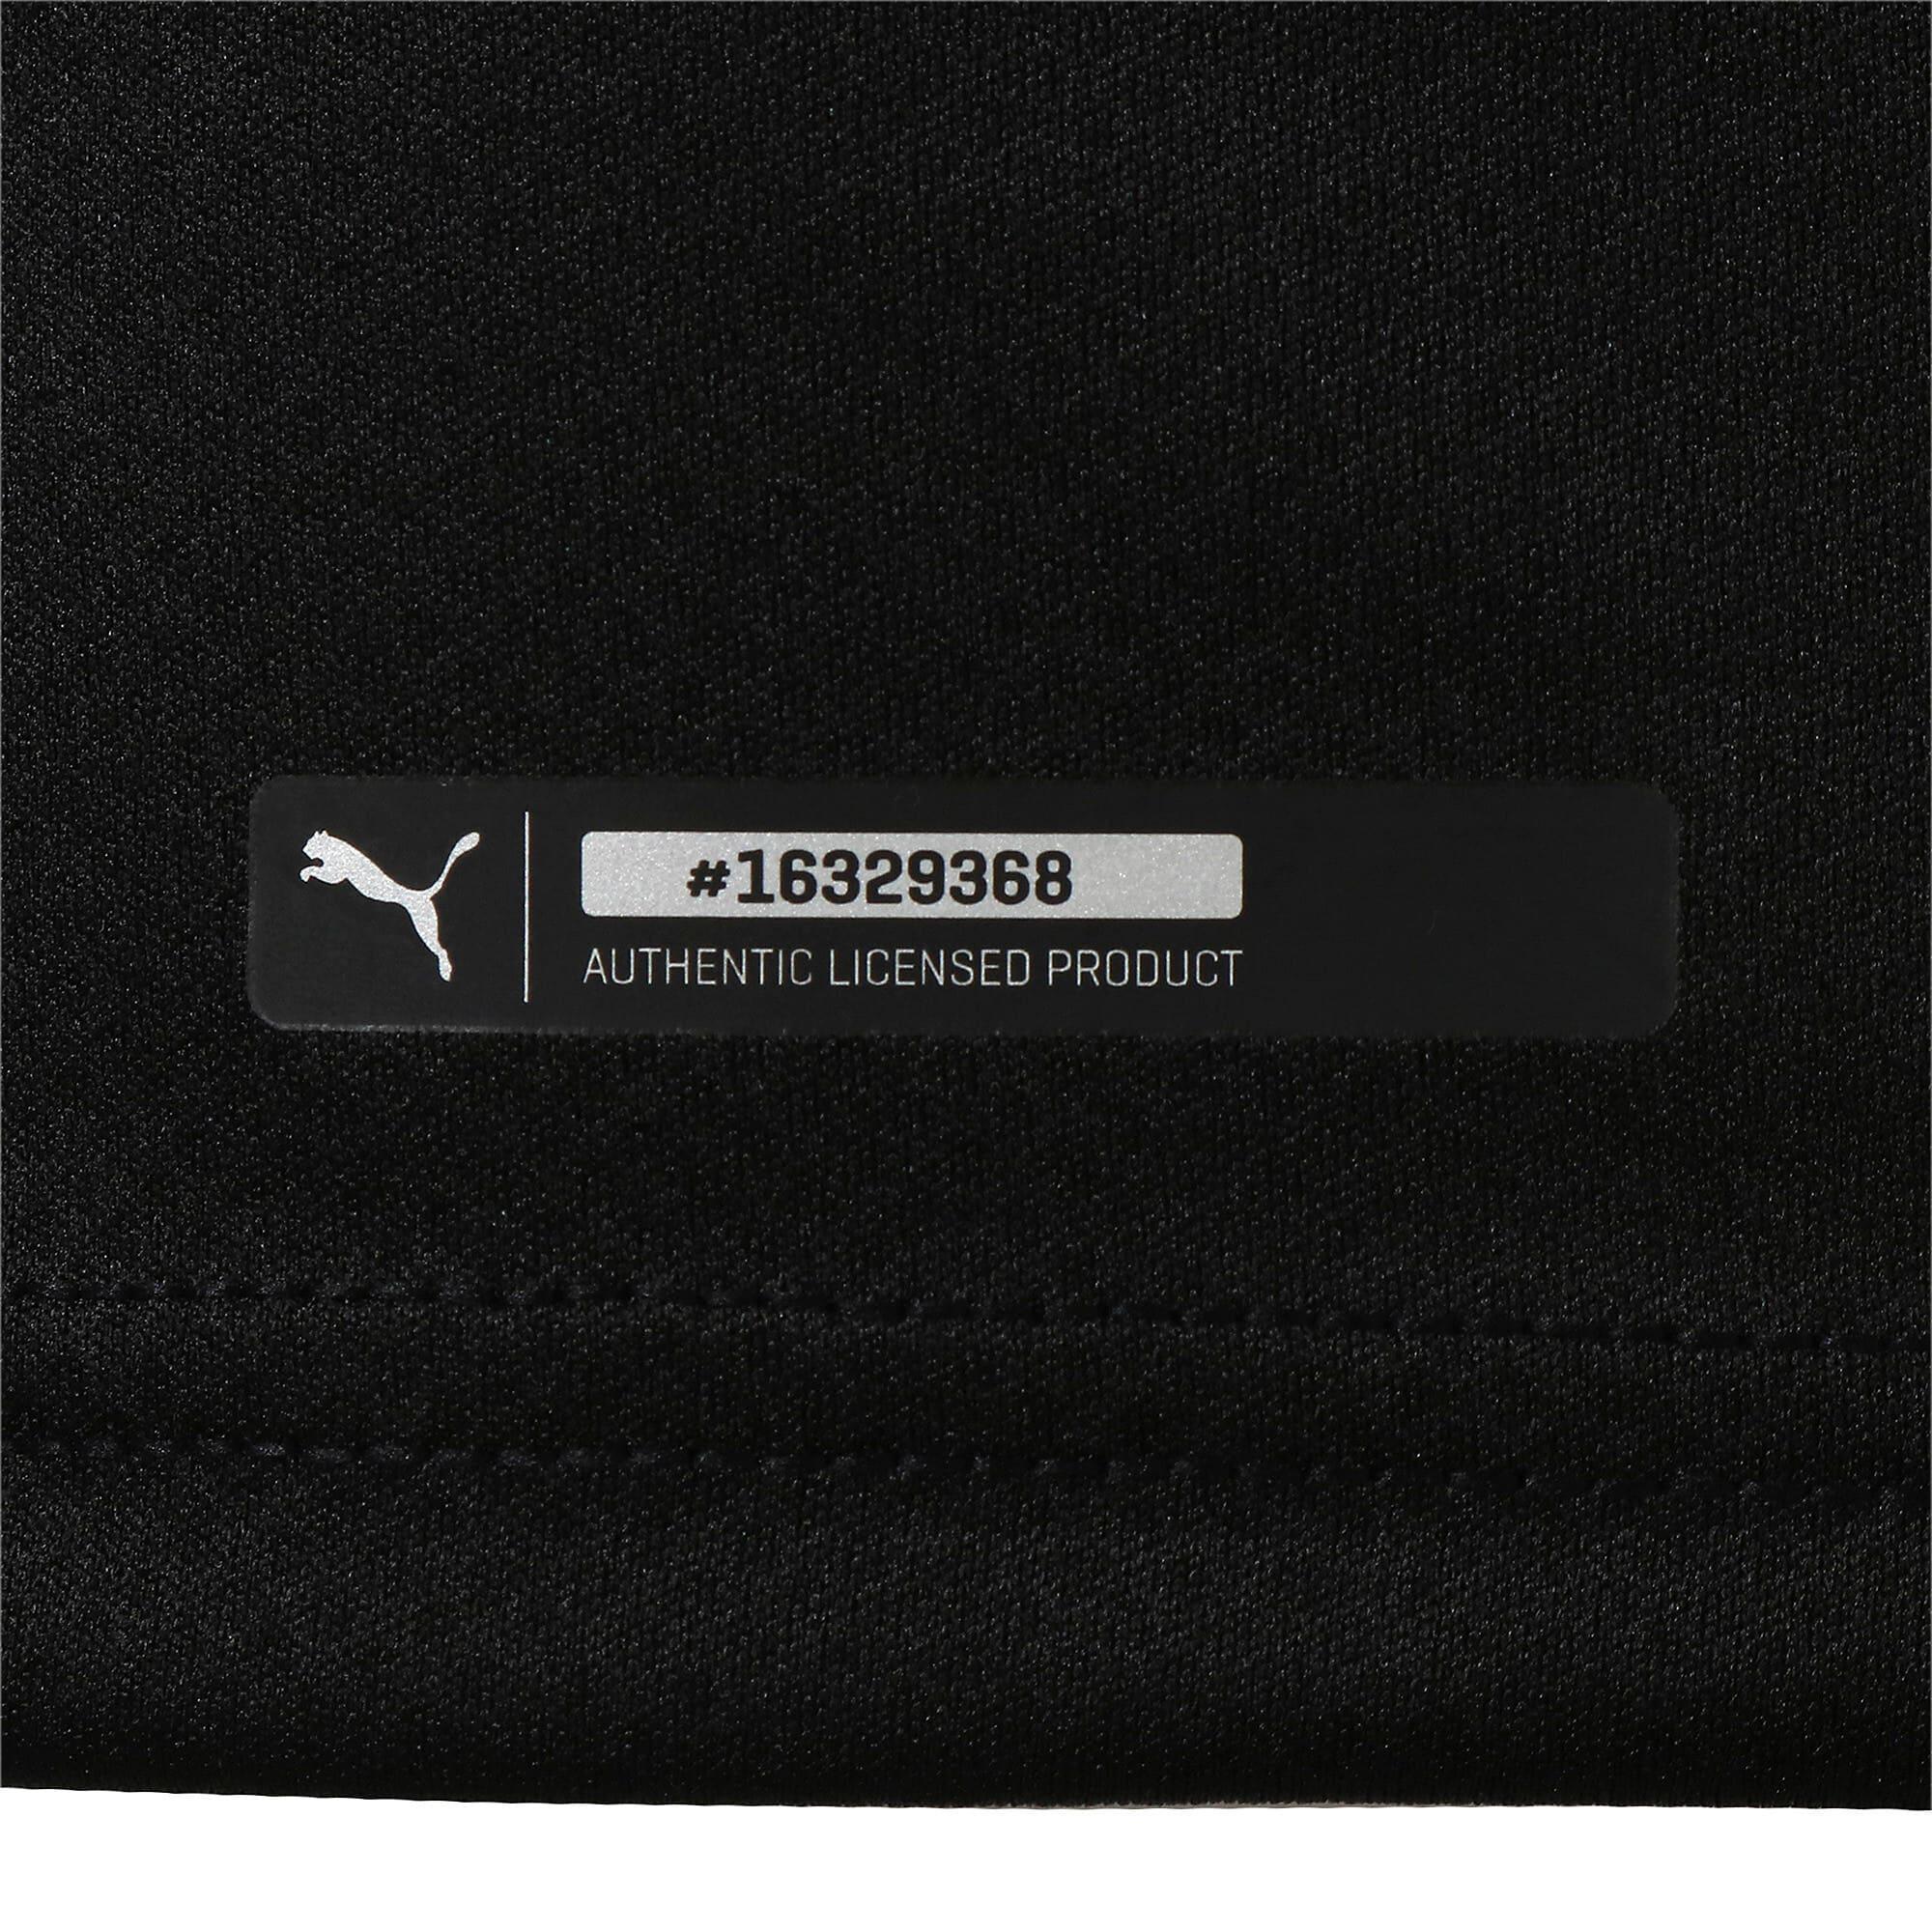 Thumbnail 9 of マンチェスター・シティ MCFC SS アウェイ レプリカシャツ 半袖, Puma Black-Georgia Peach, medium-JPN